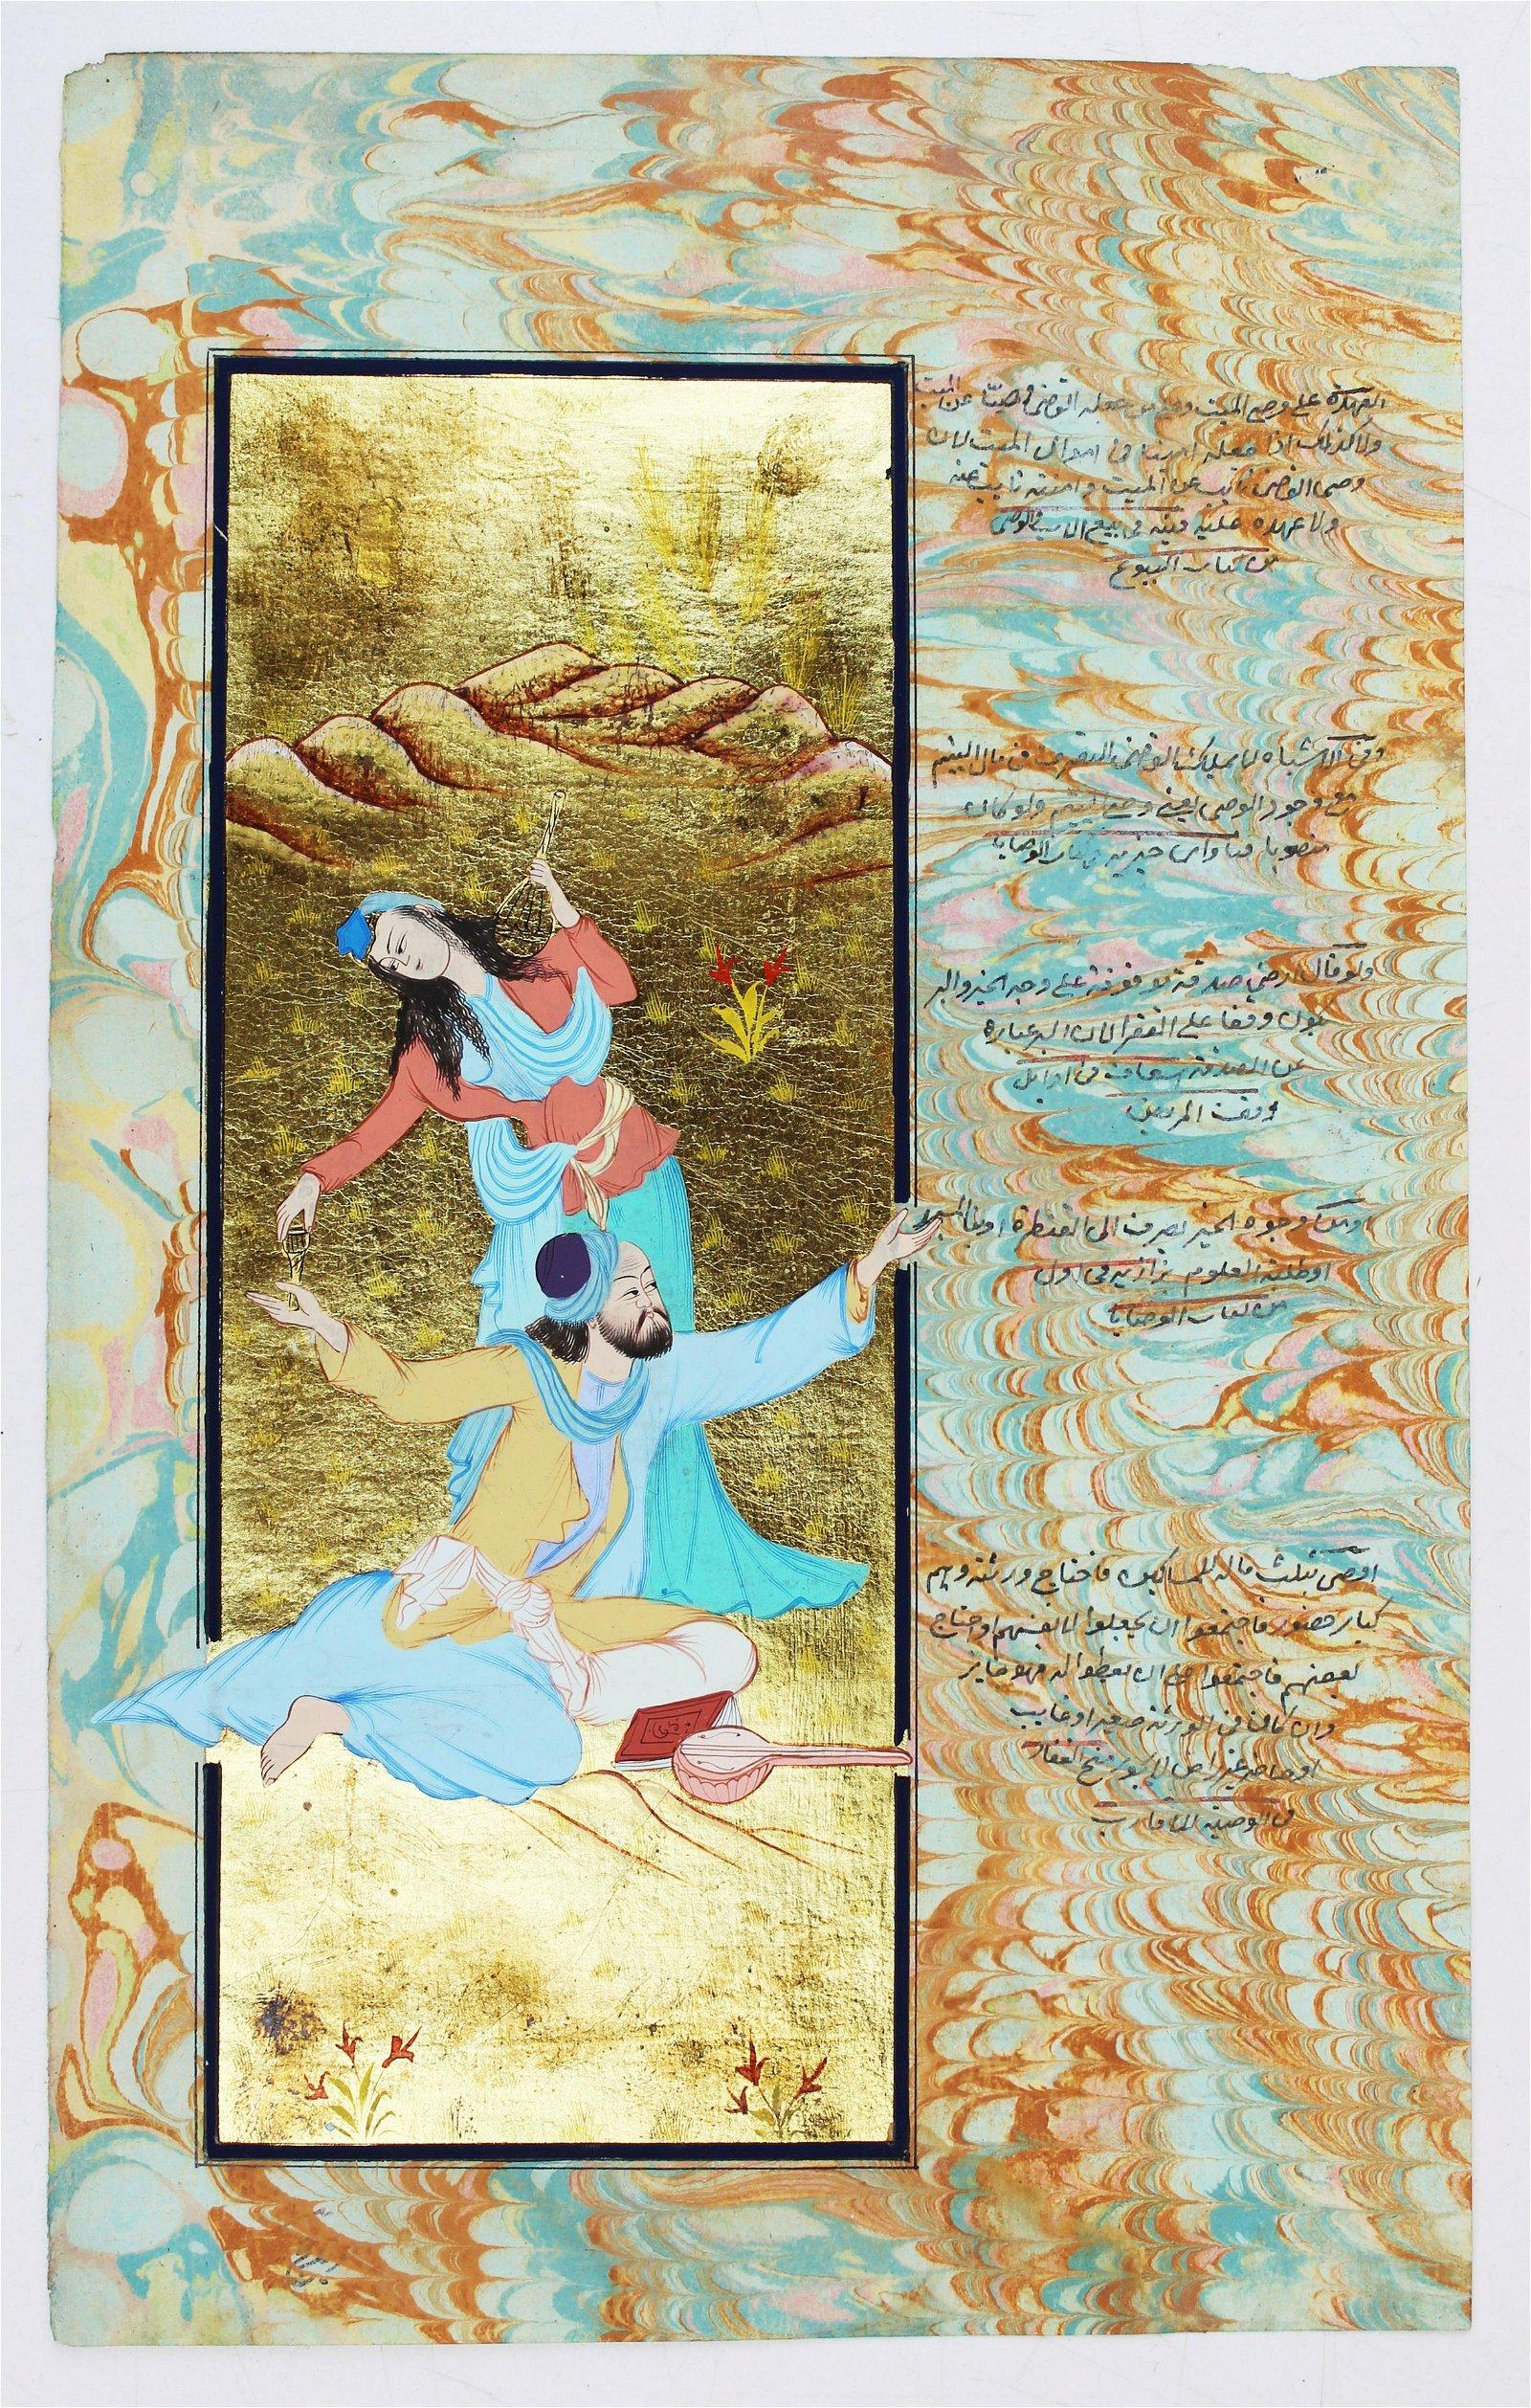 18th c Indo-Persian illuminated manuscript page